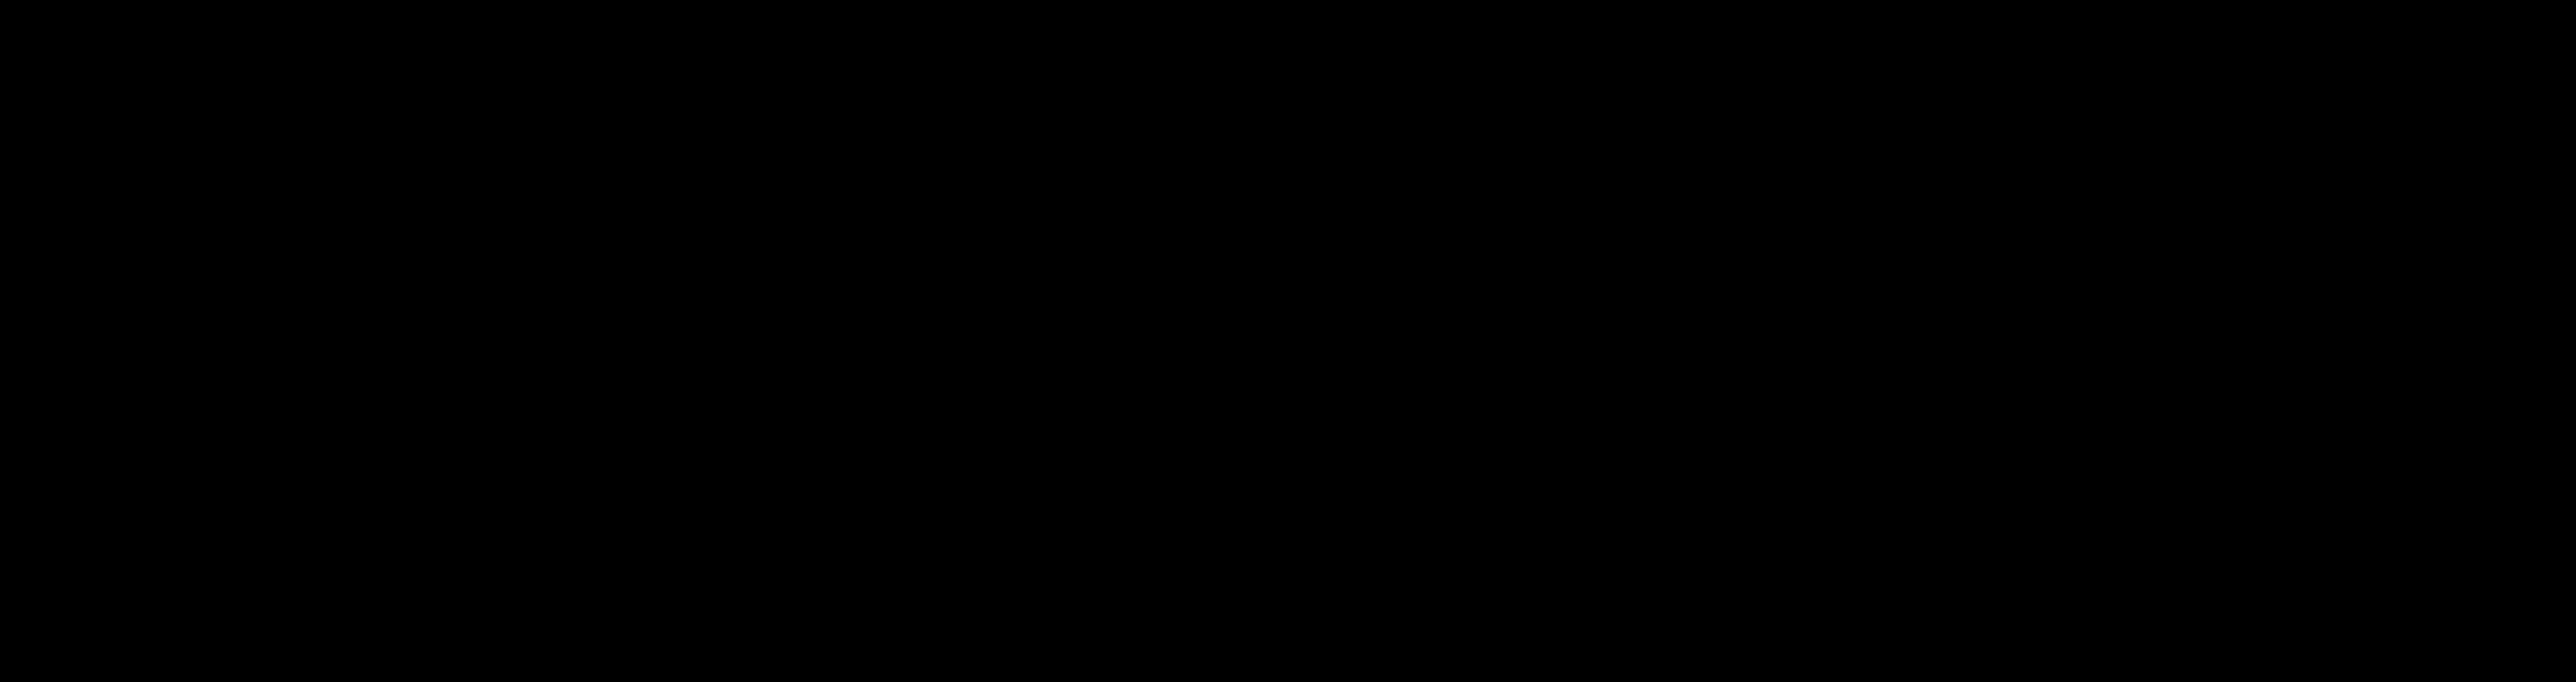 CLT010-12